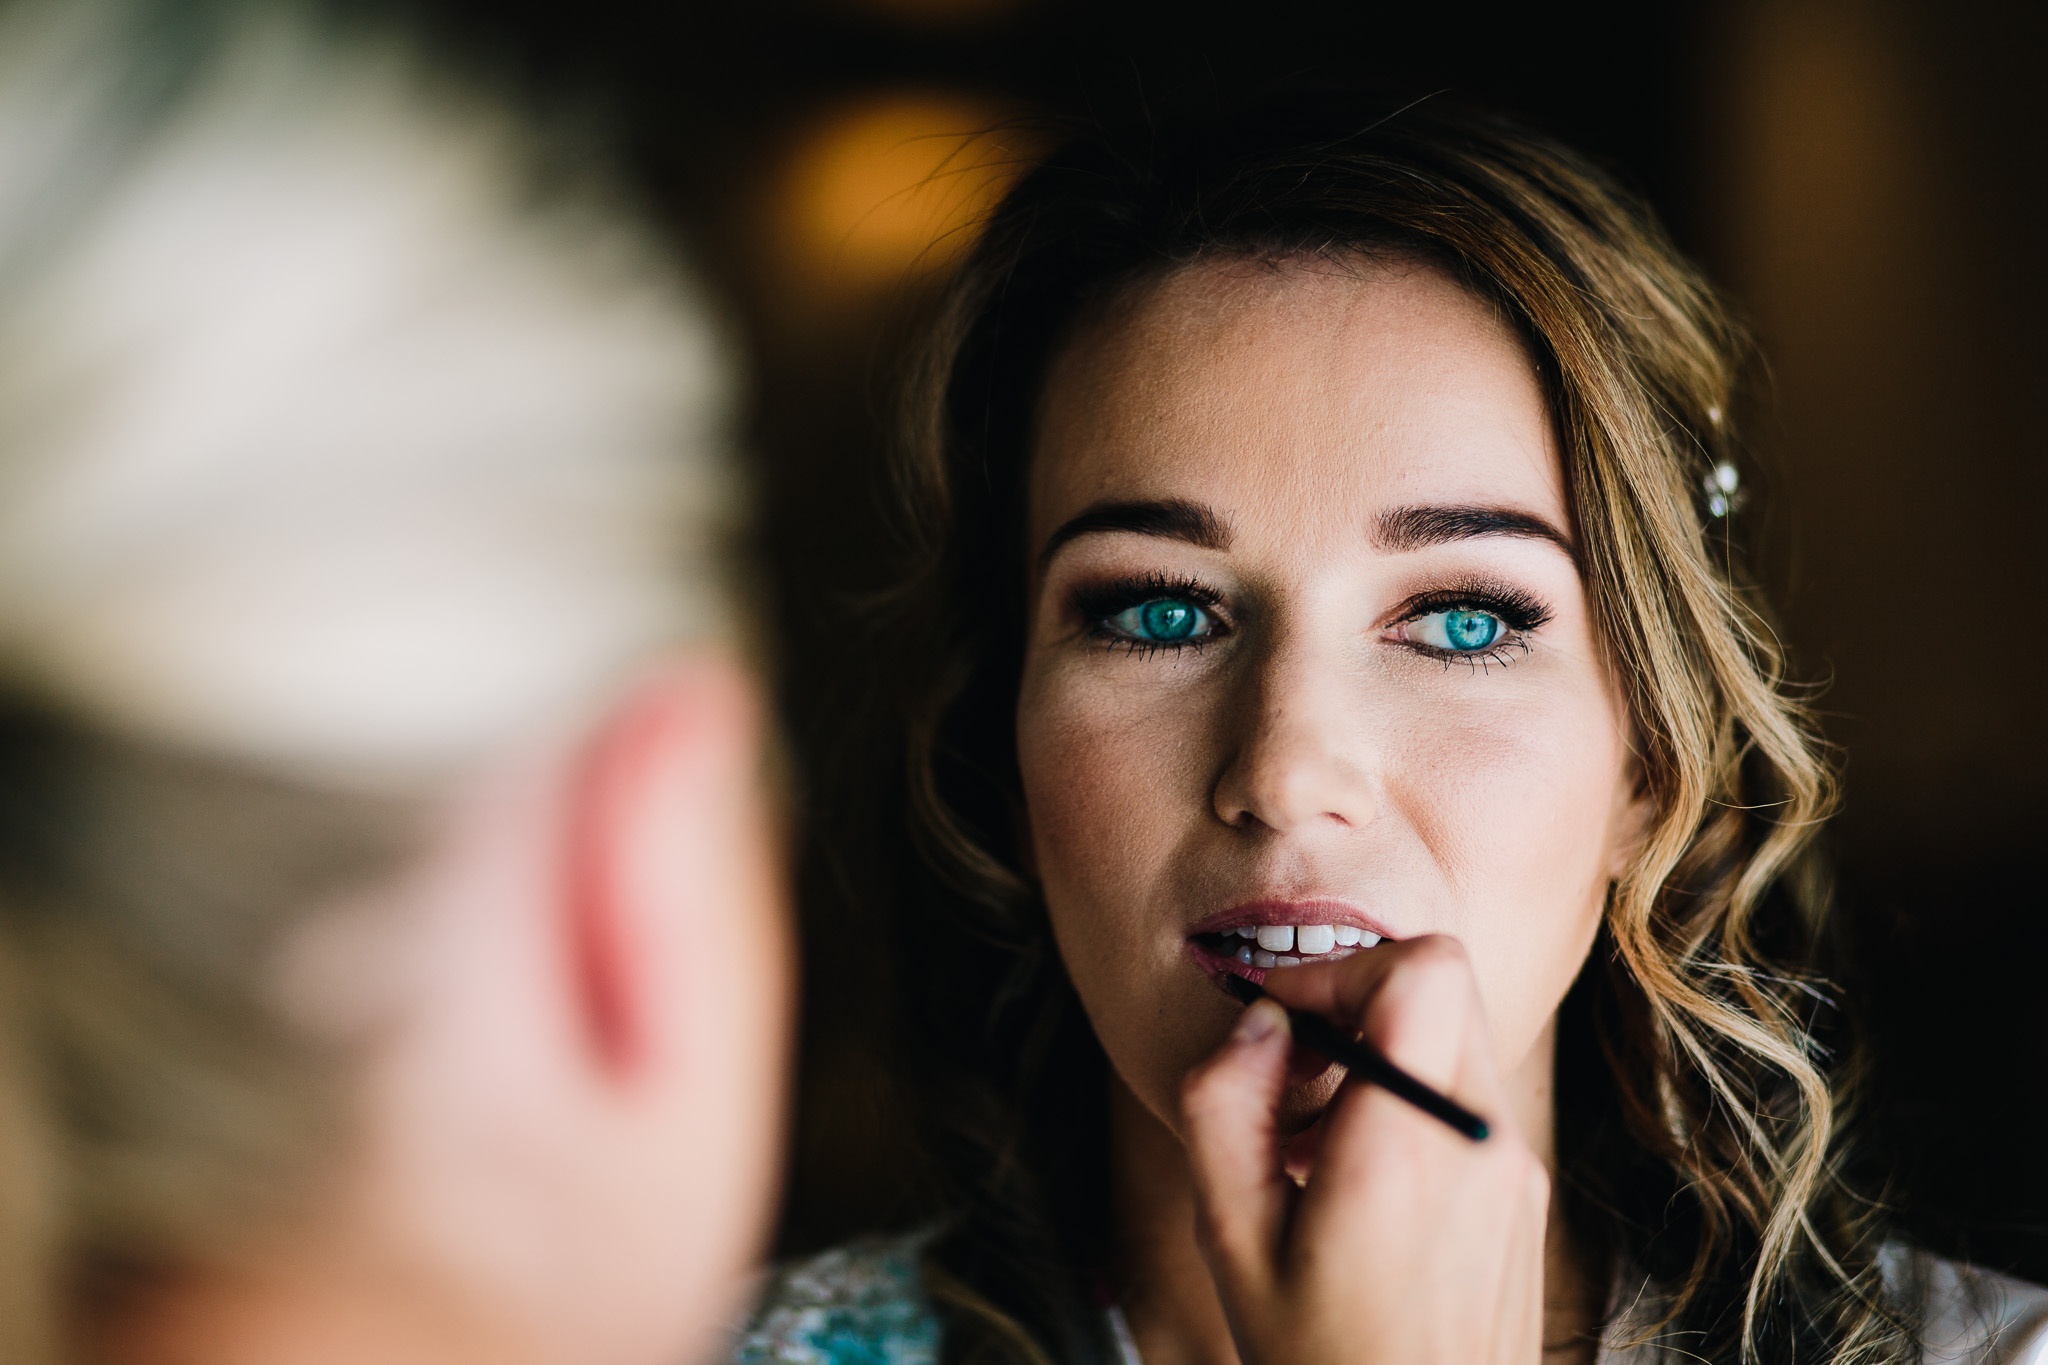 BRIDAL MAKE UP BY KAYE SALMON WEDDING MAKE UP ARTIST